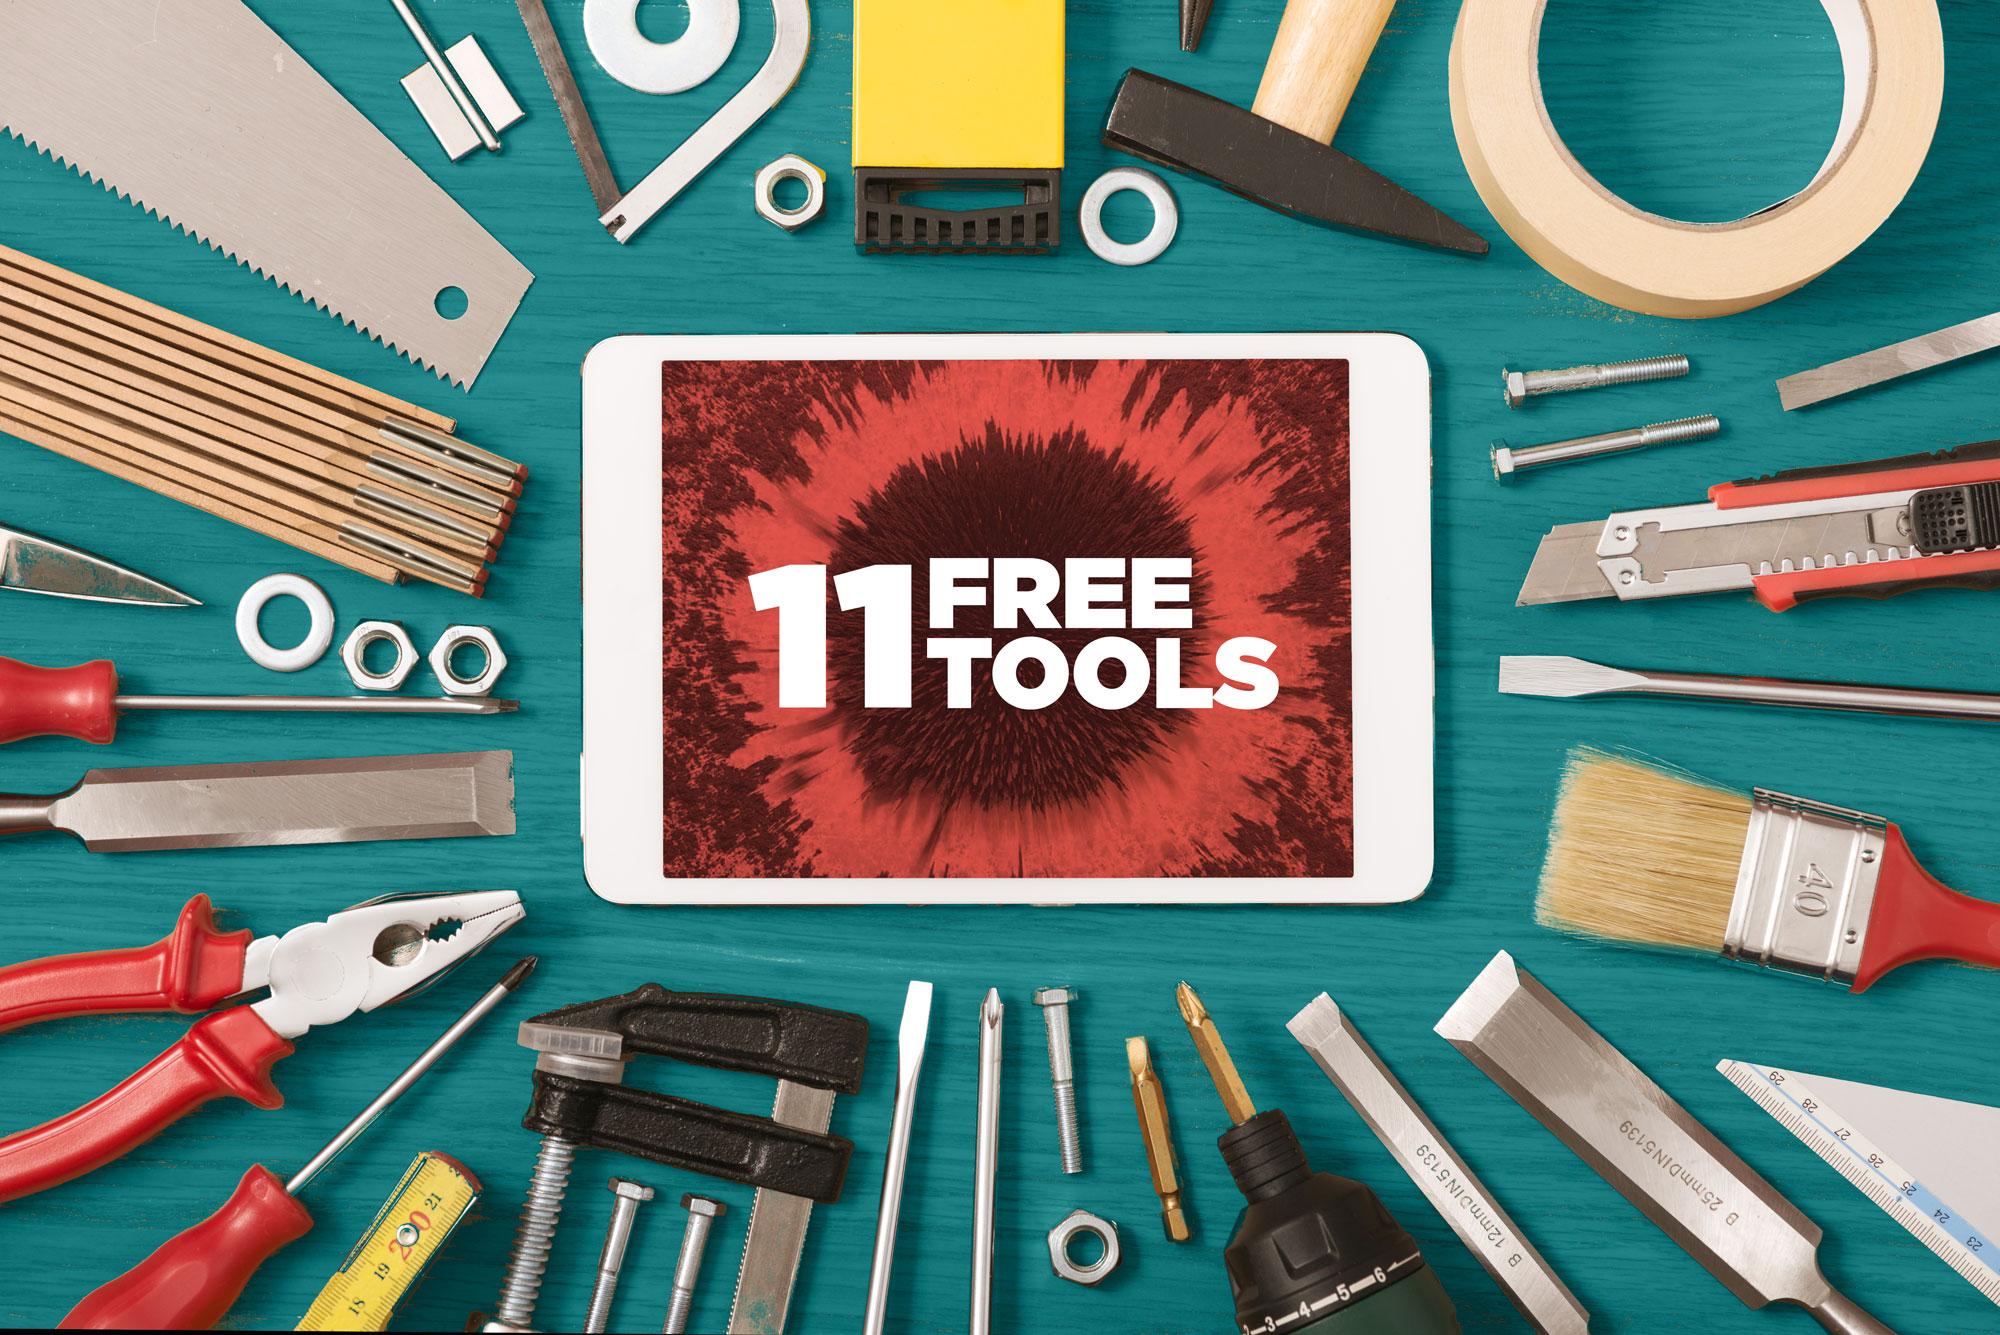 11 free tools